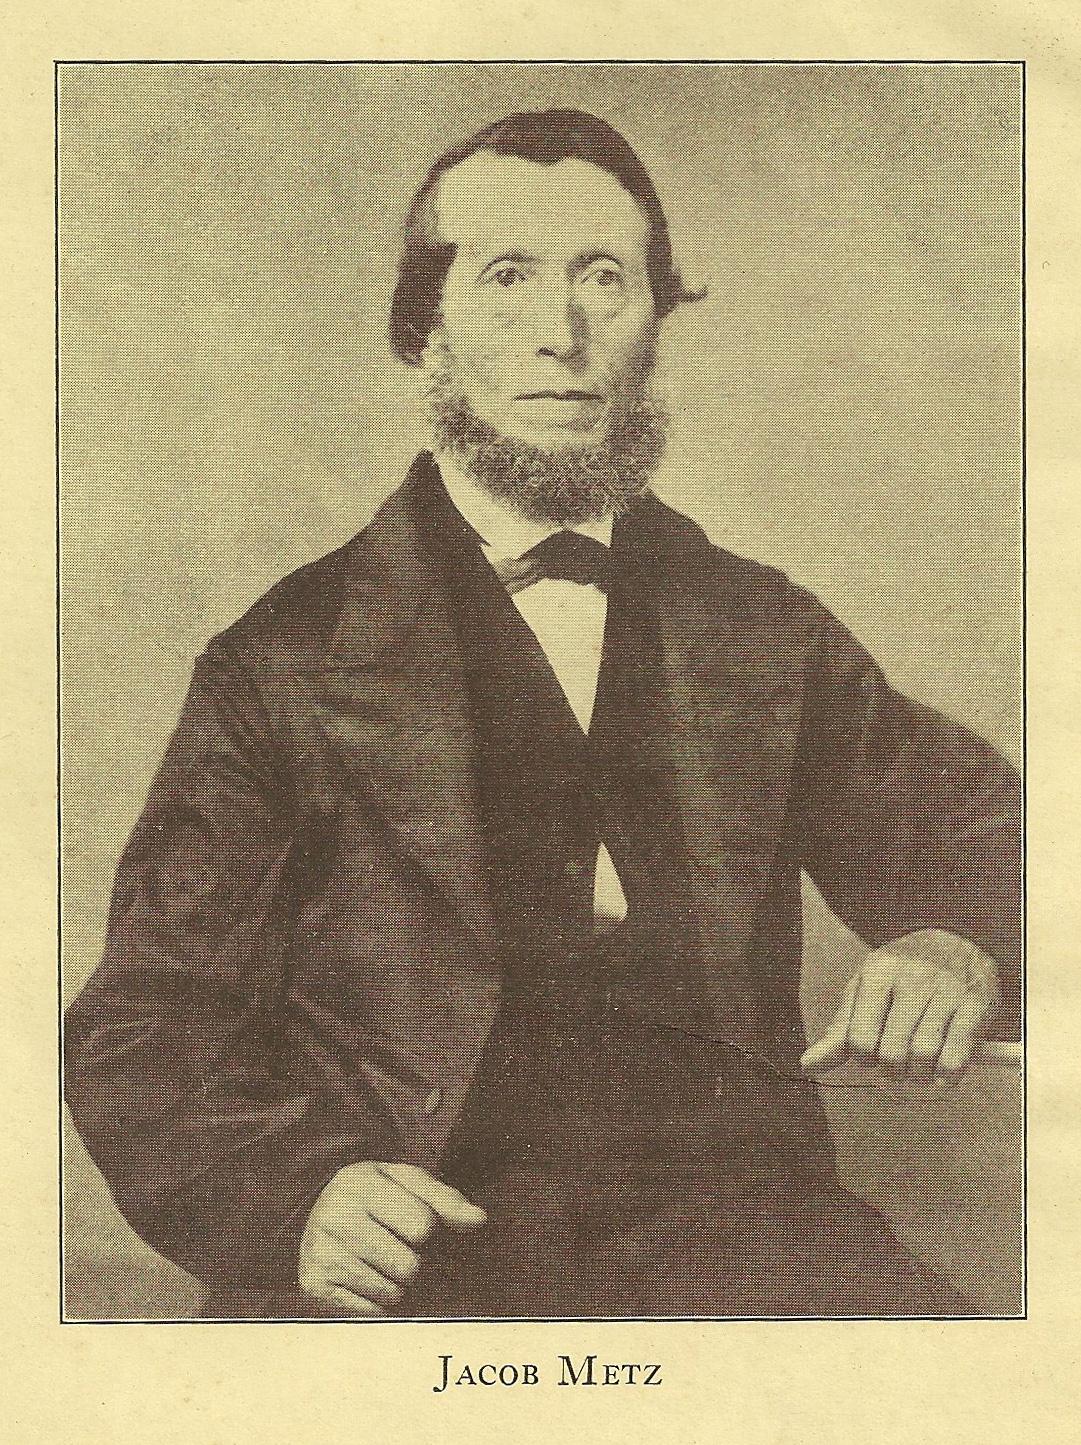 Jacob Metz